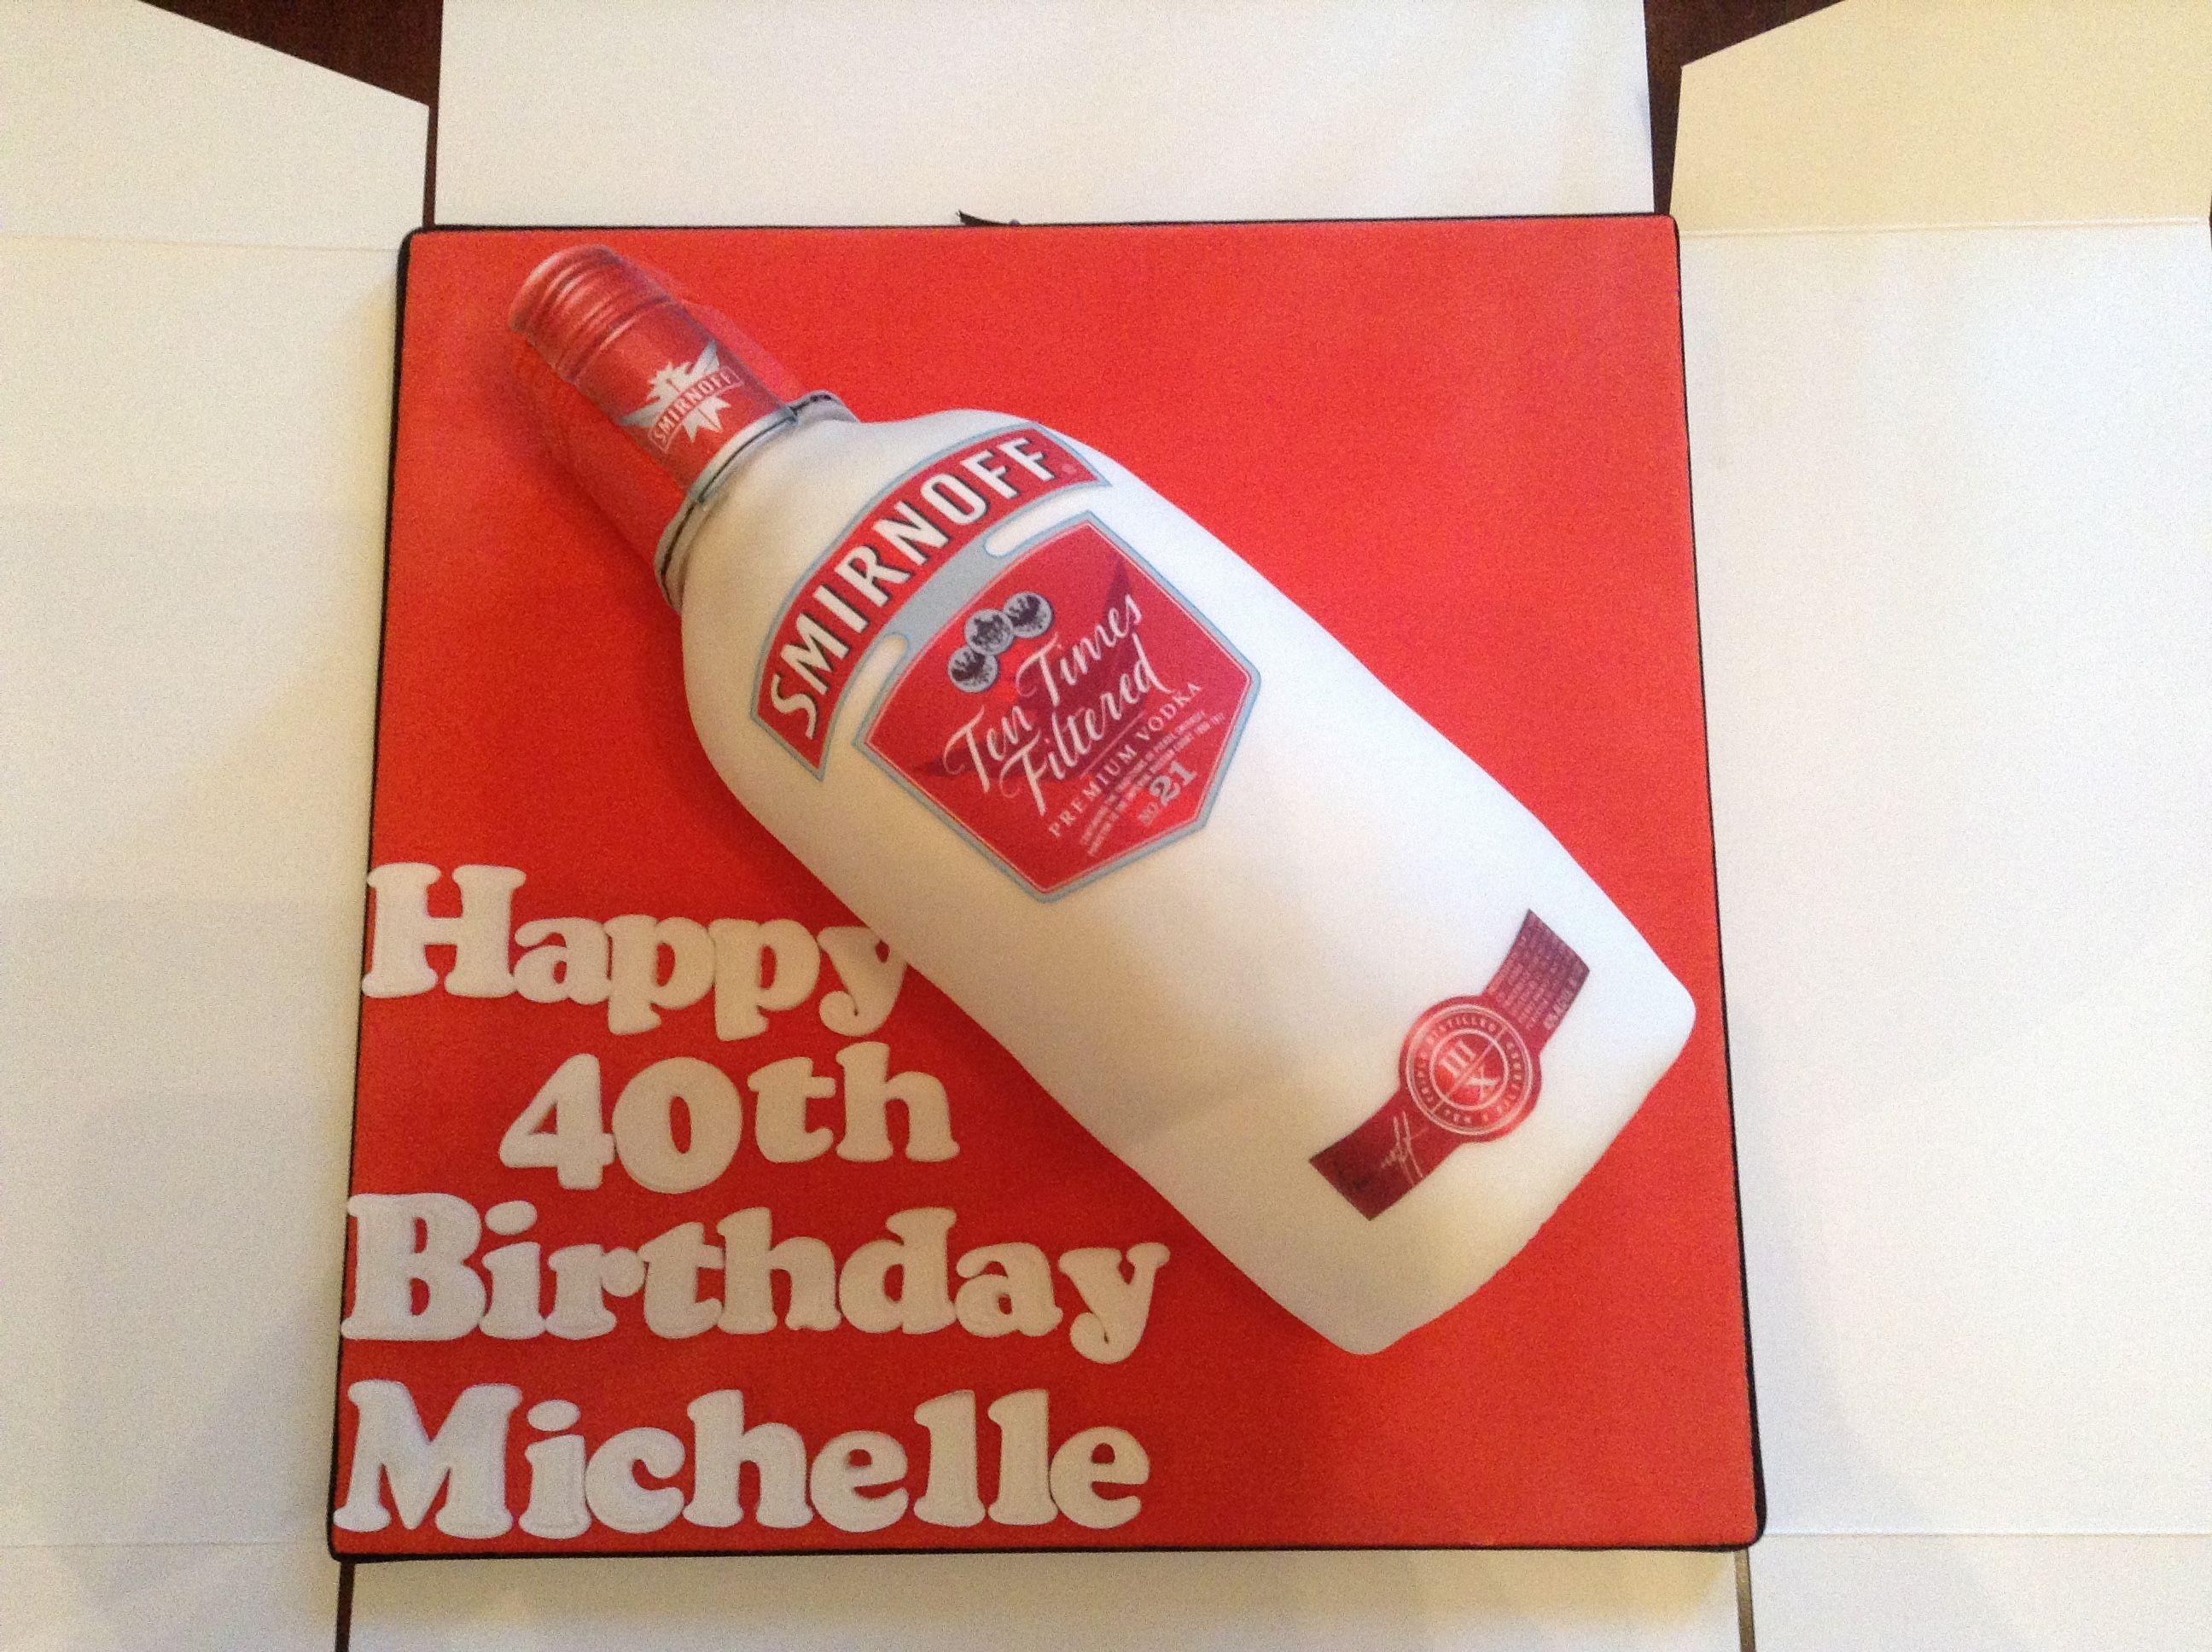 Bottle of vodka smirnoff cake from cakes by nicky